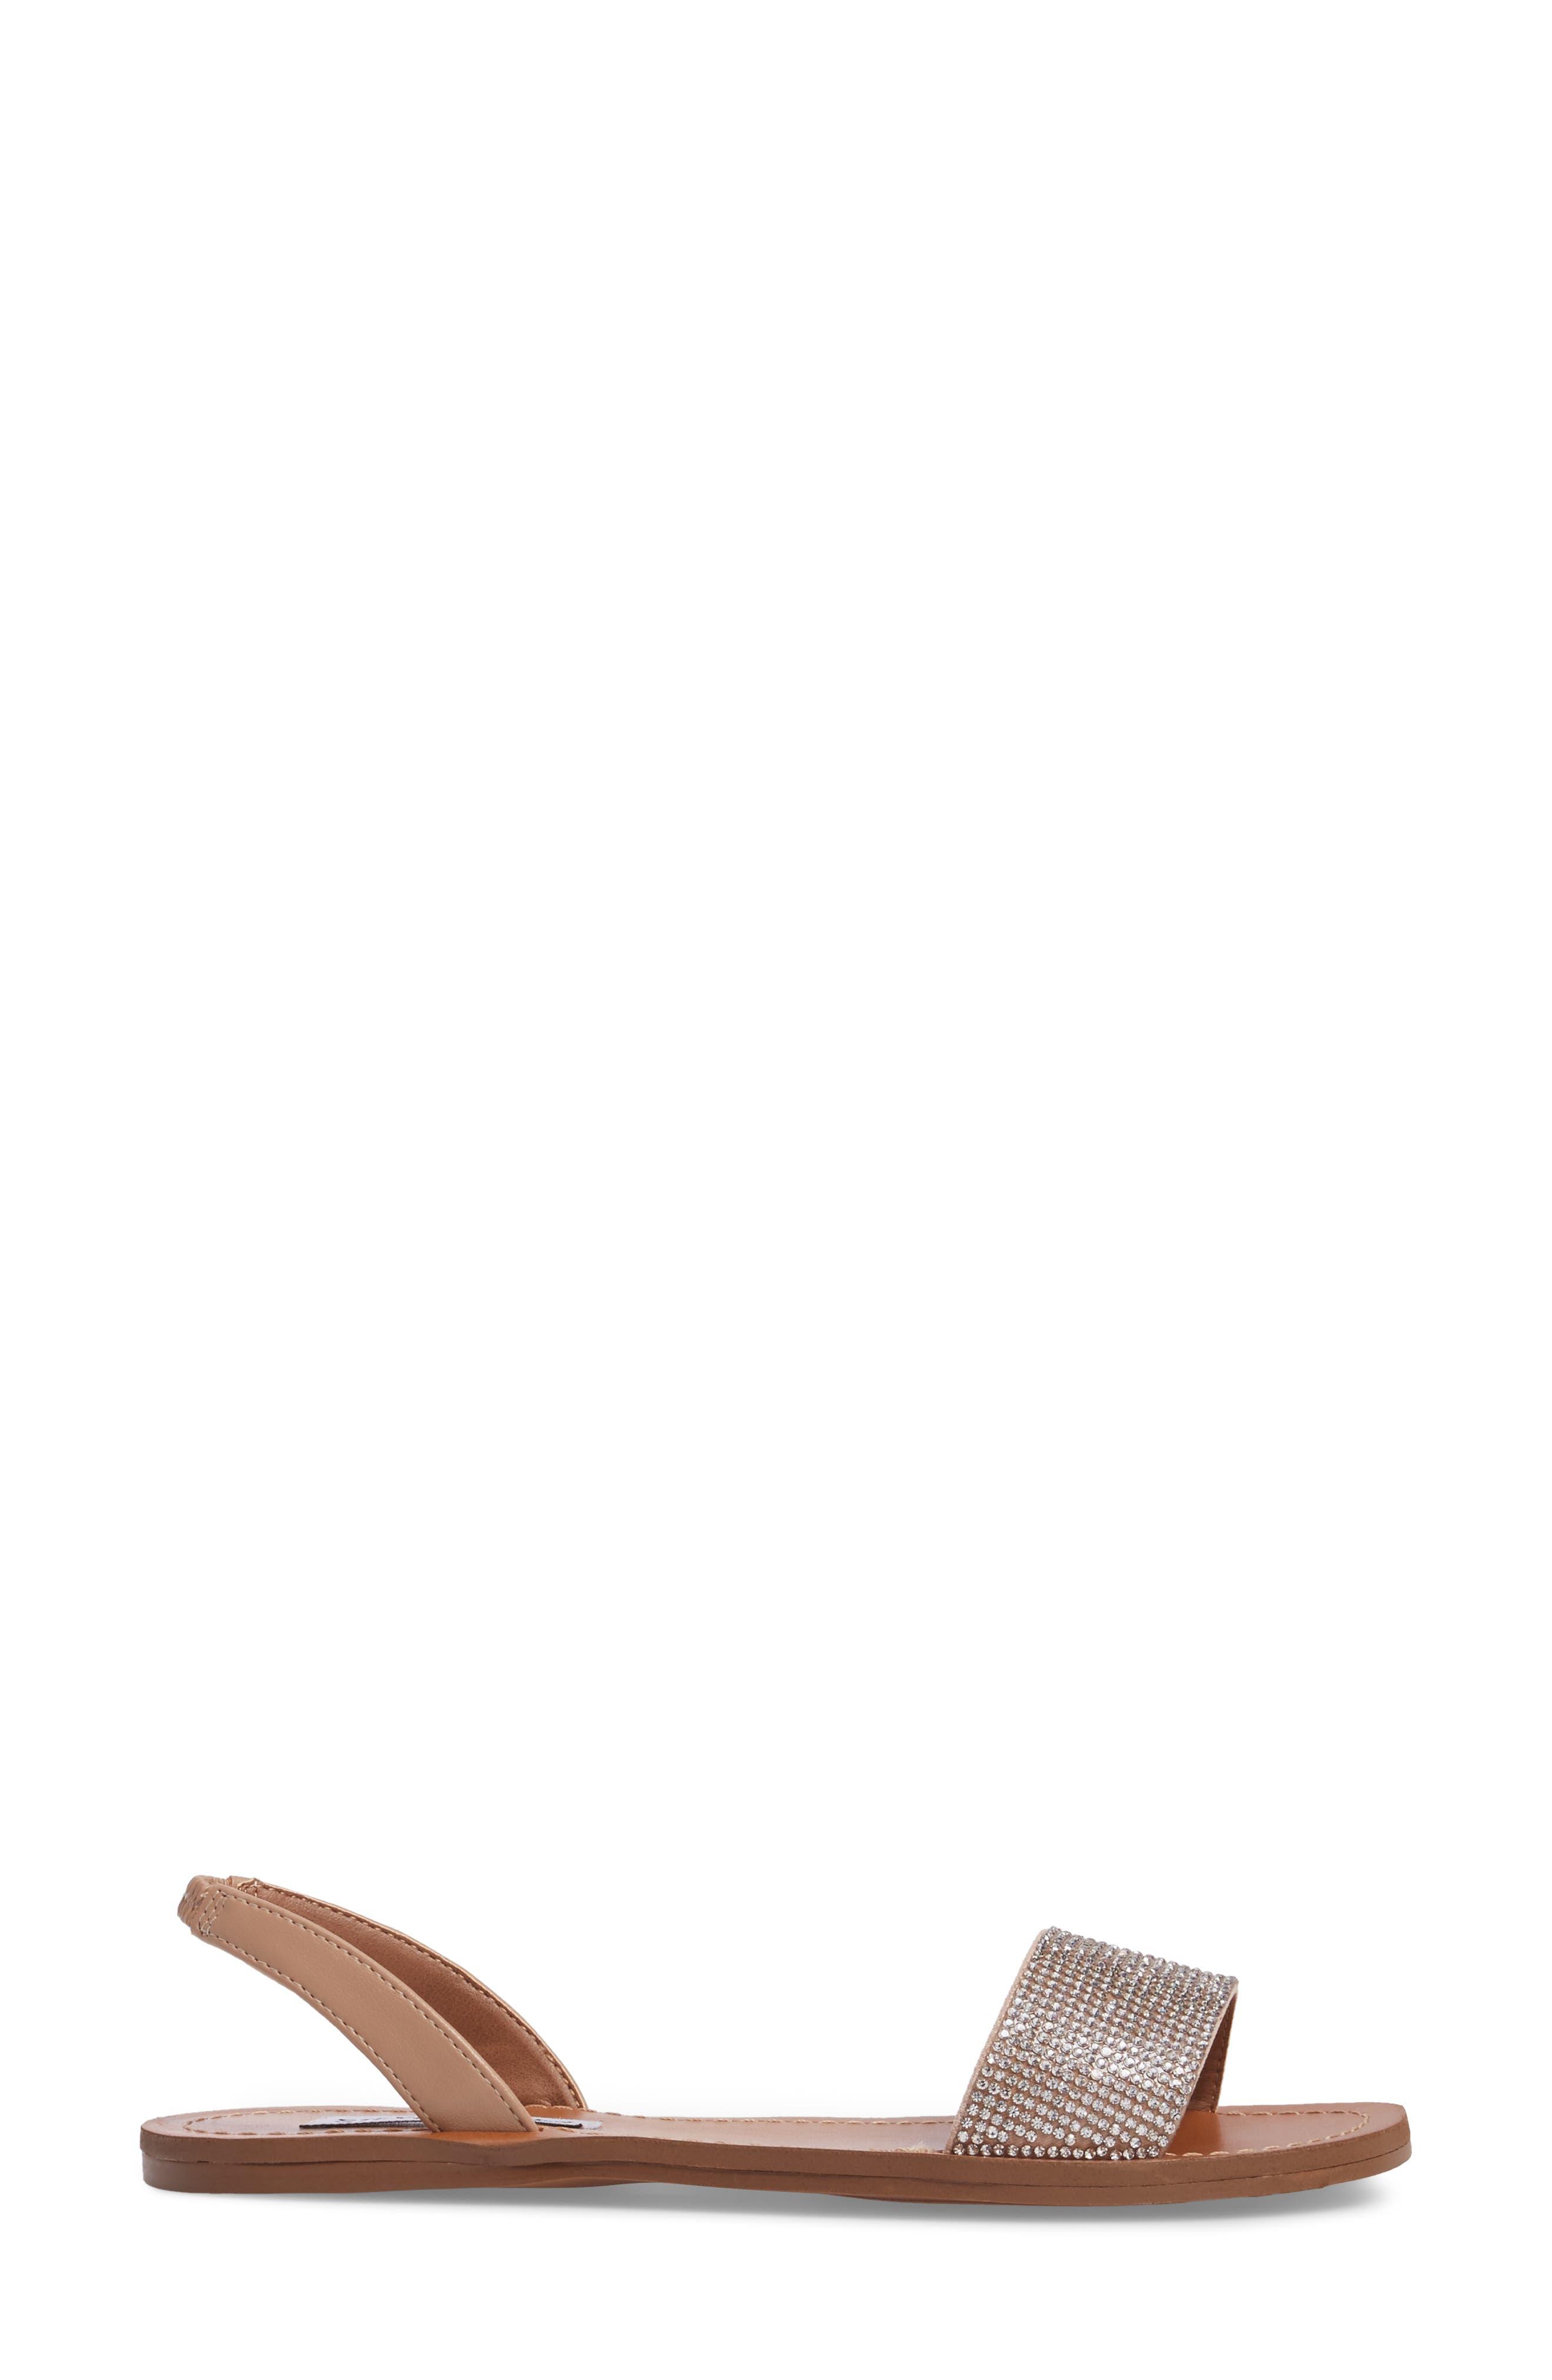 Rock Sandal,                             Alternate thumbnail 3, color,                             Rhinestone Faux Leather